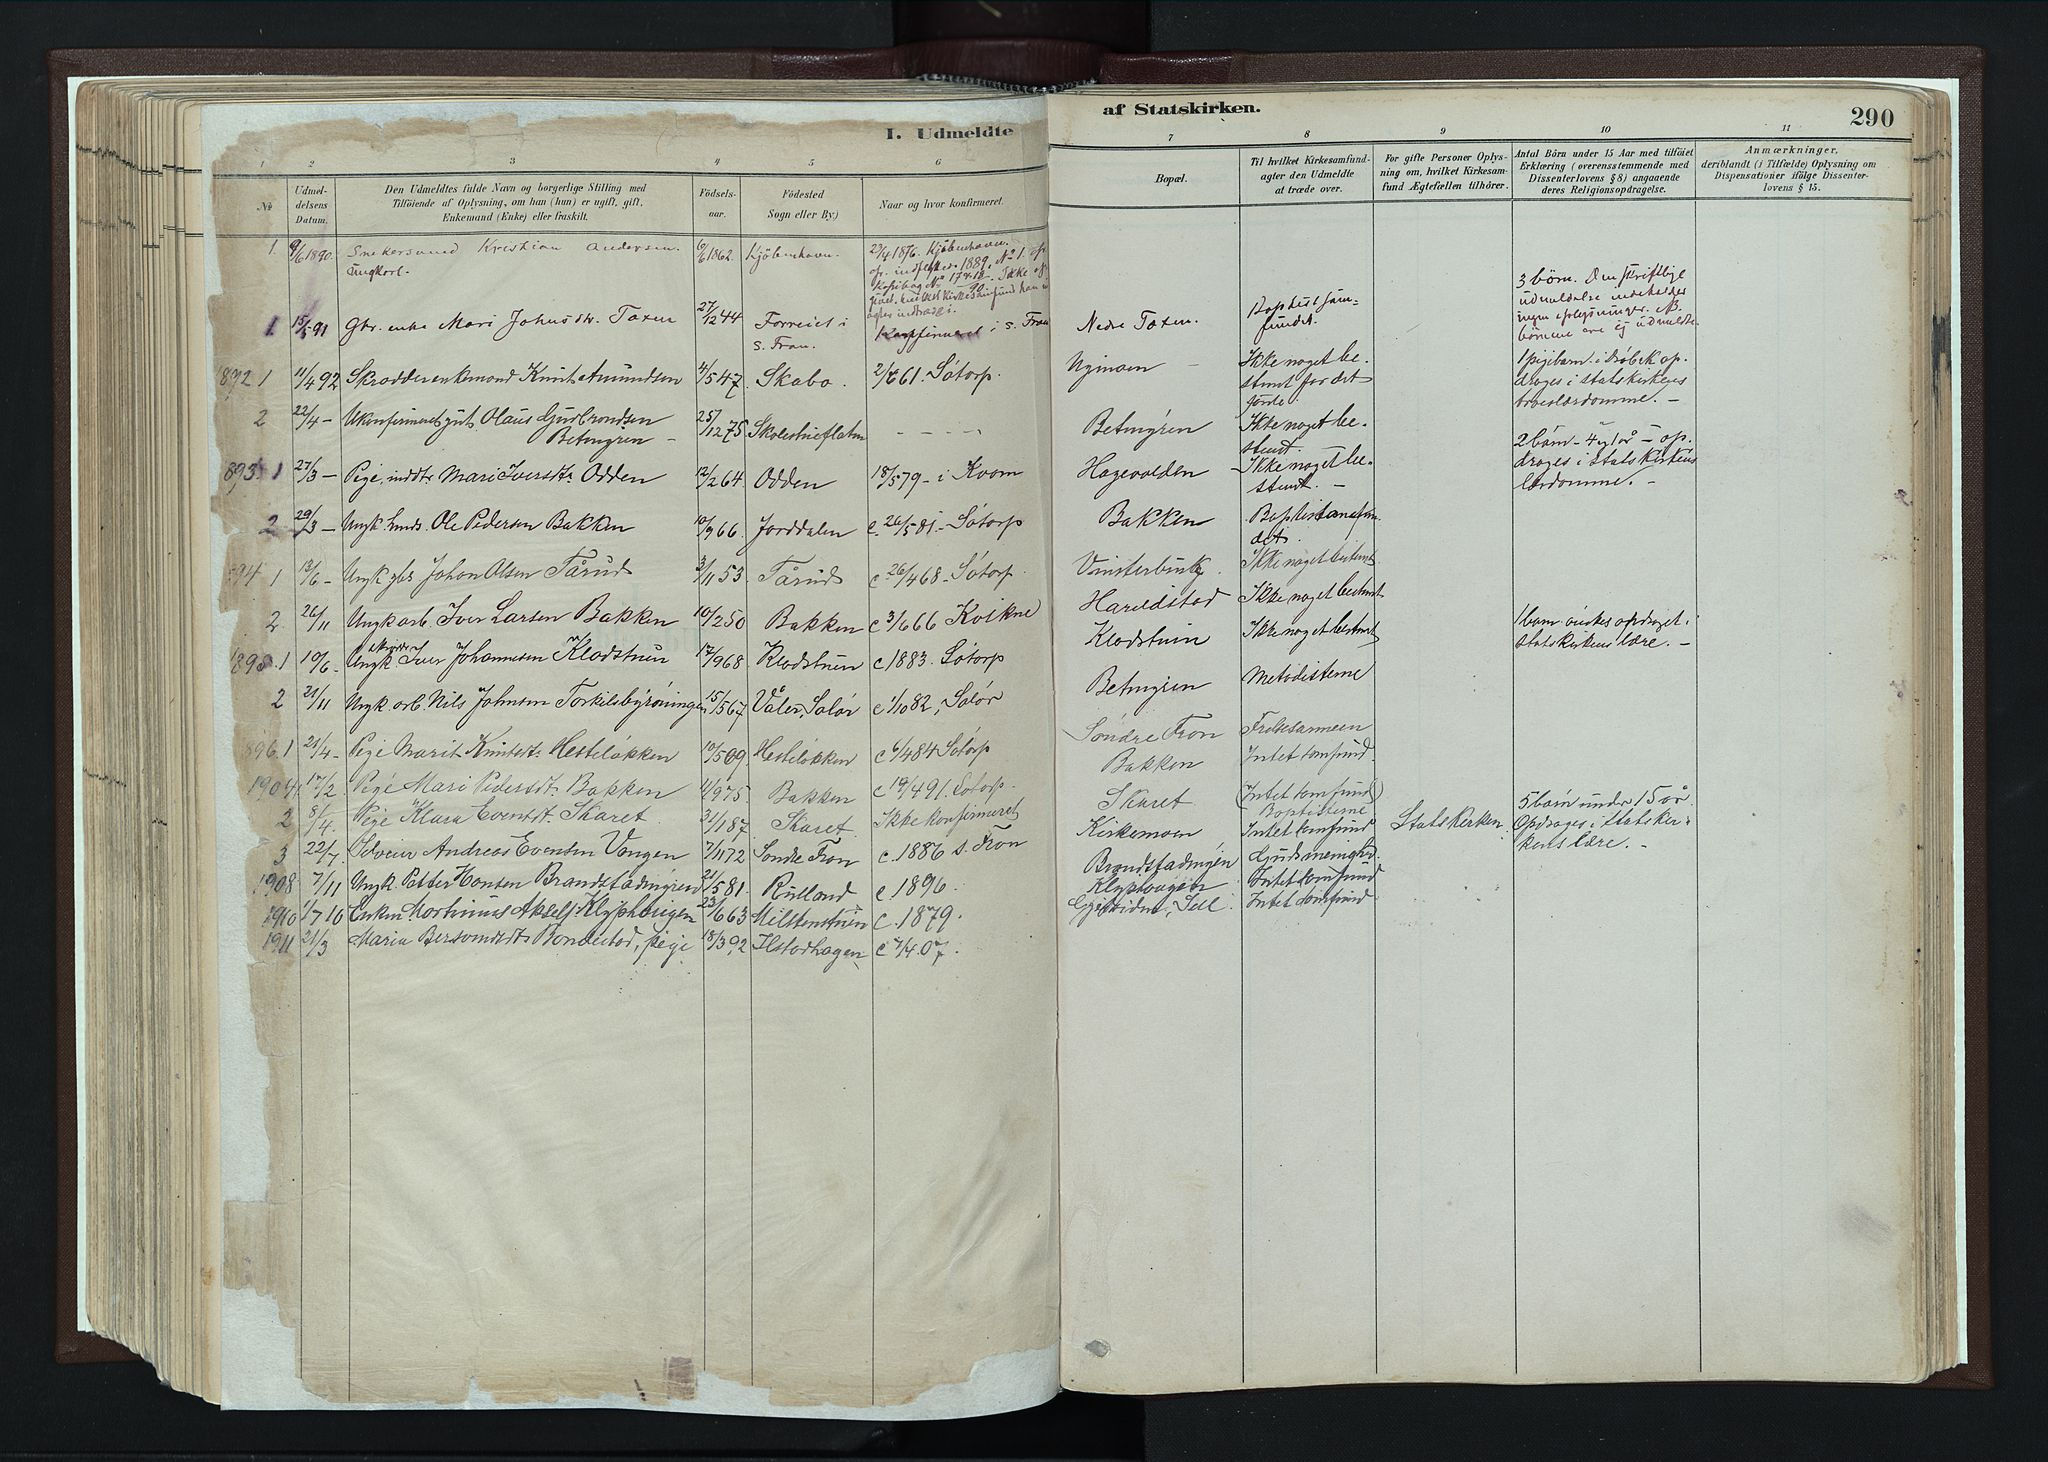 SAH, Nord-Fron prestekontor, Ministerialbok nr. 4, 1884-1914, s. 290